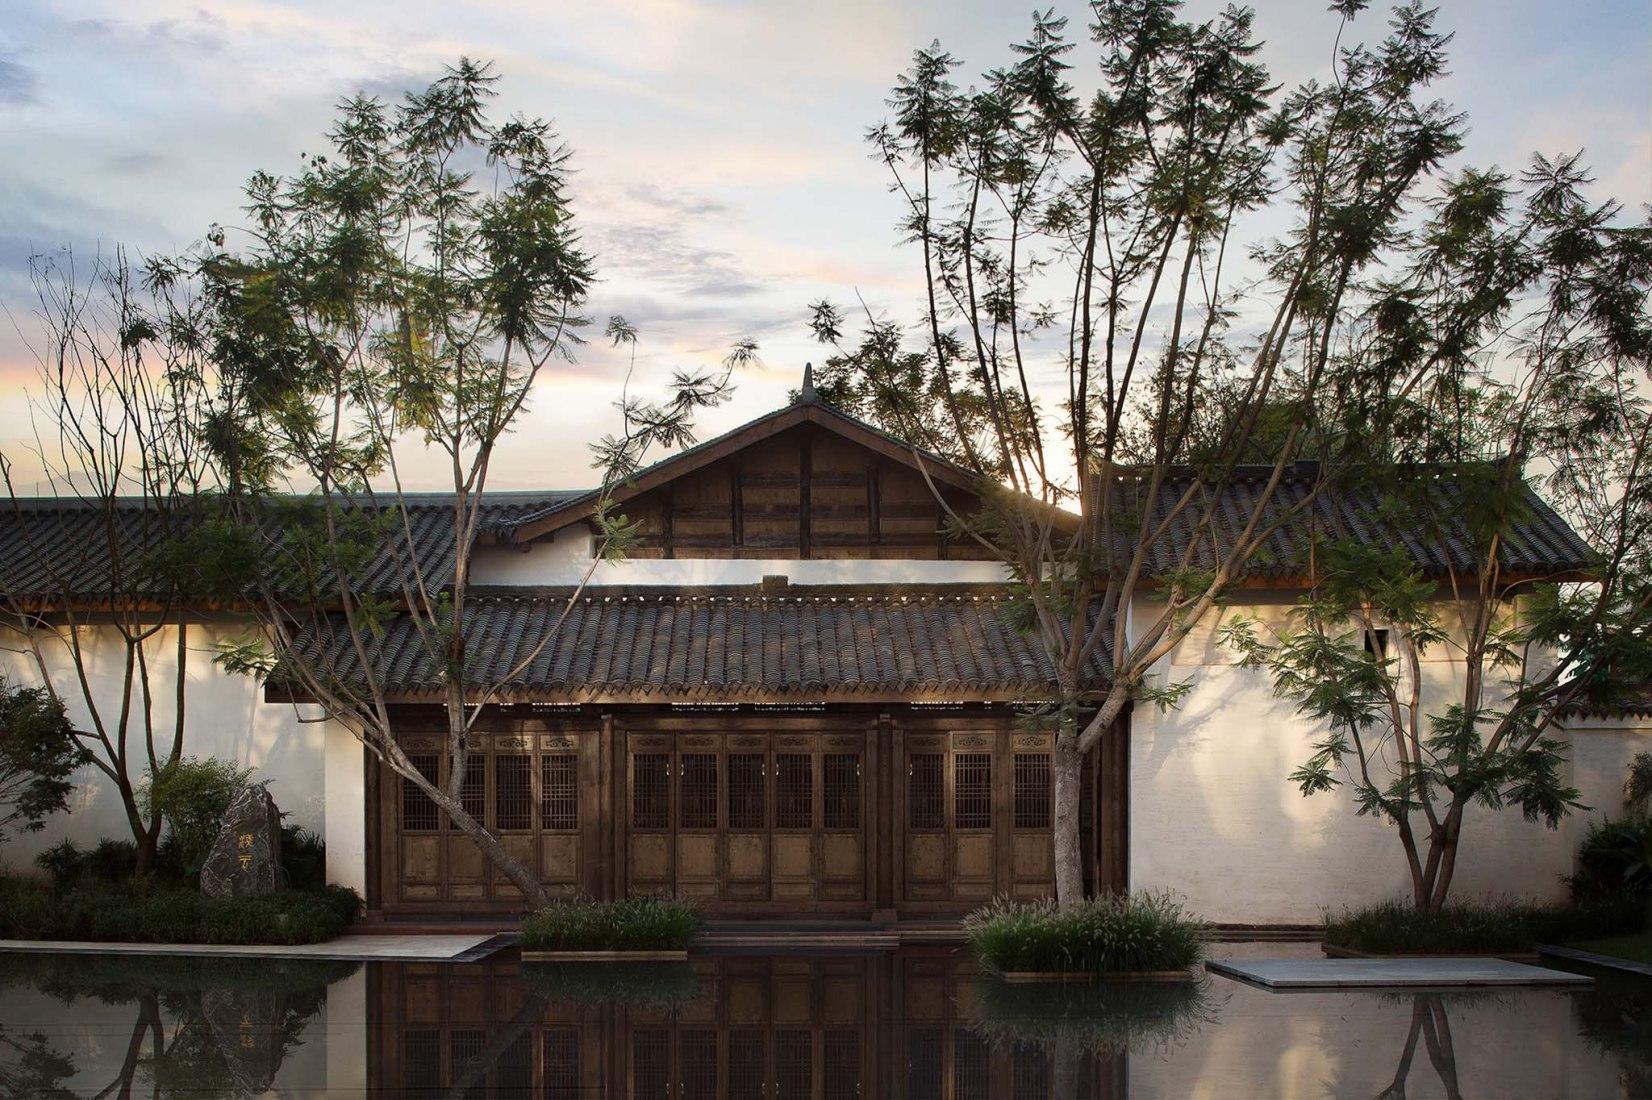 International Tourist Resort - General Mansion by IDMatrix. Photograph by Interpretation & Sublimation